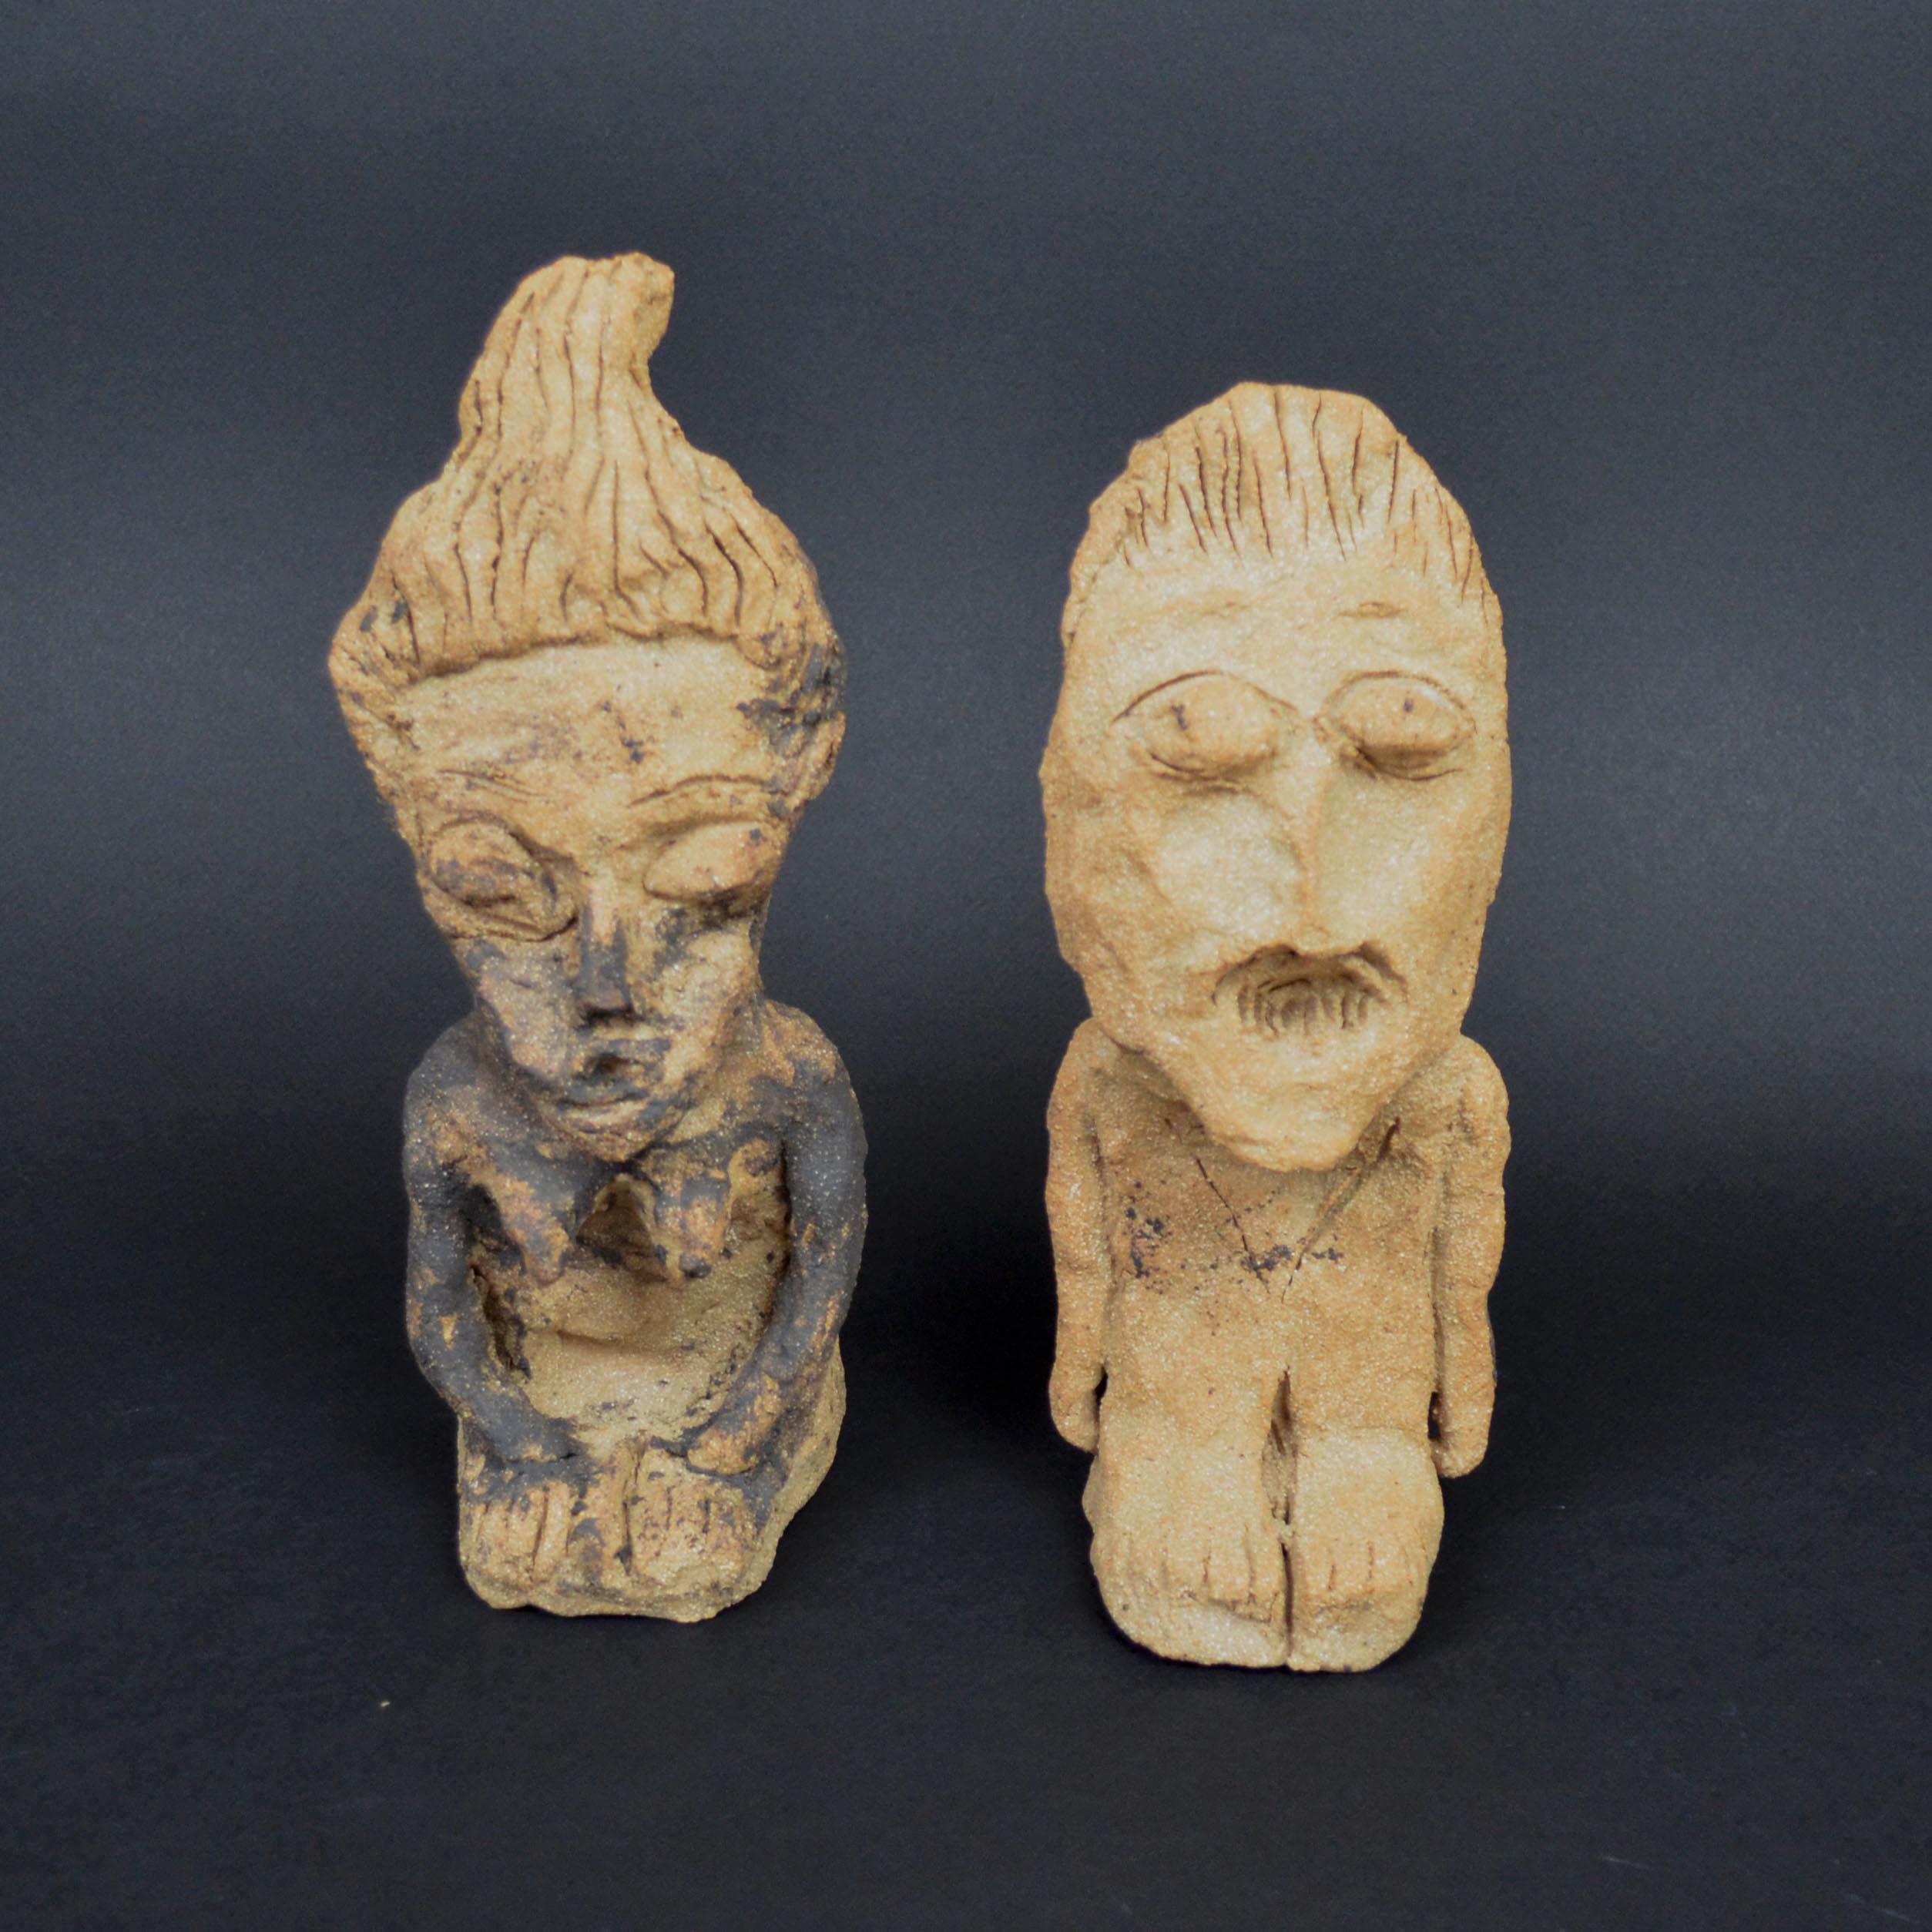 cours de poterie tournage Bourgogne